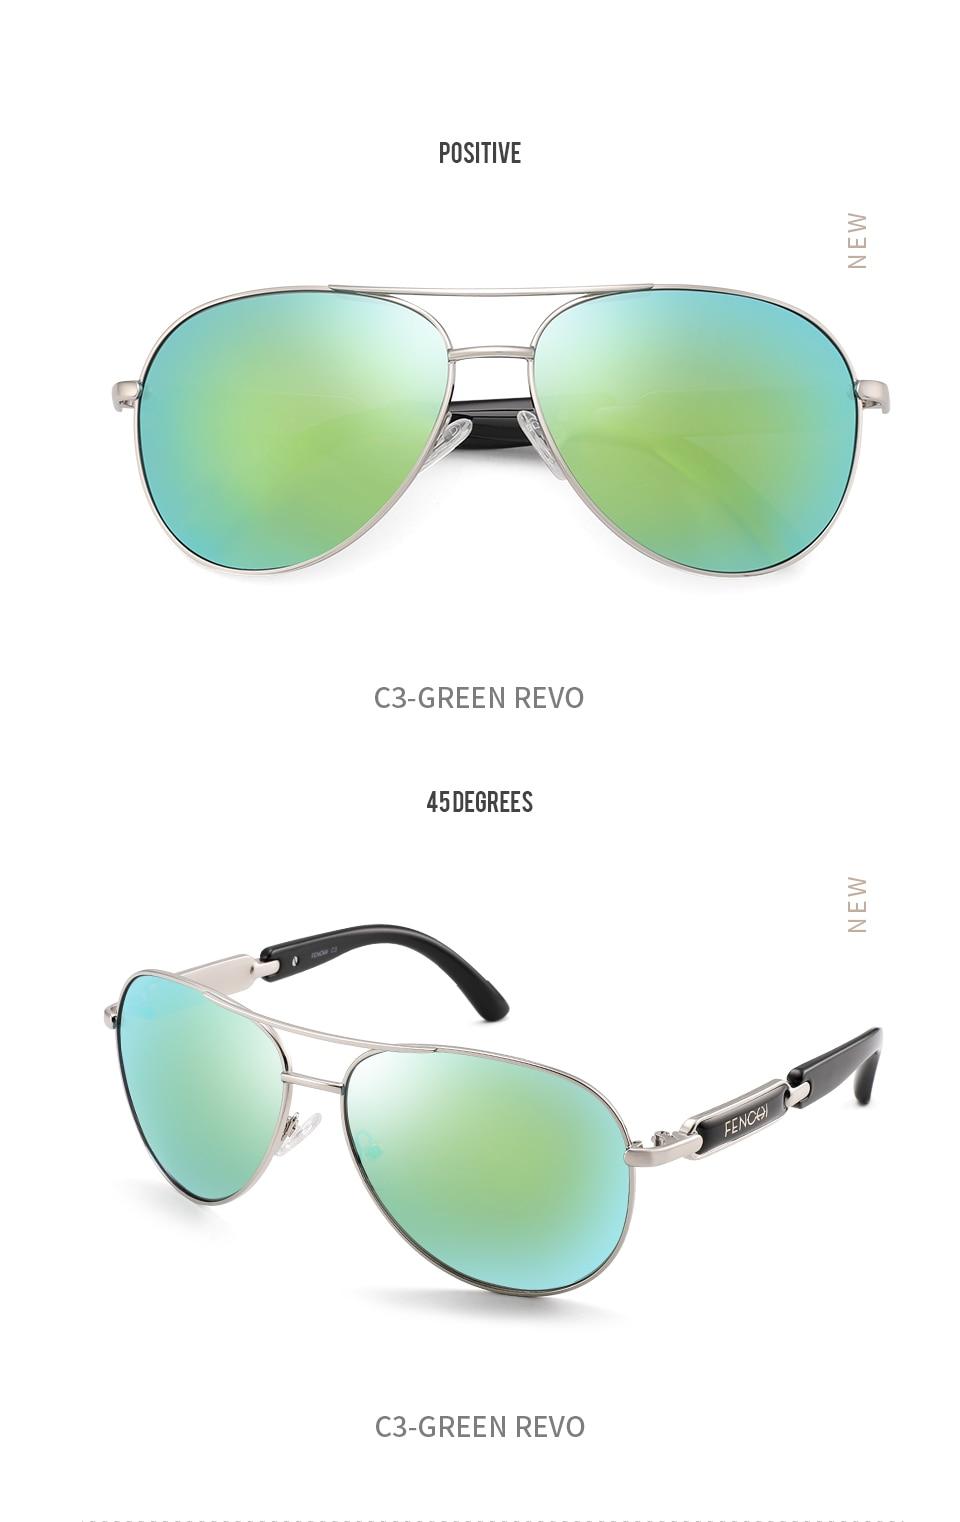 Hbe2839b6a1344f078807cbf3fadb28e5U FENCHI Polarized Sunglasses Women Vintage Brand Glasses Driving Pilot Pink Mirror sunglasses Men ladies oculos de sol feminino